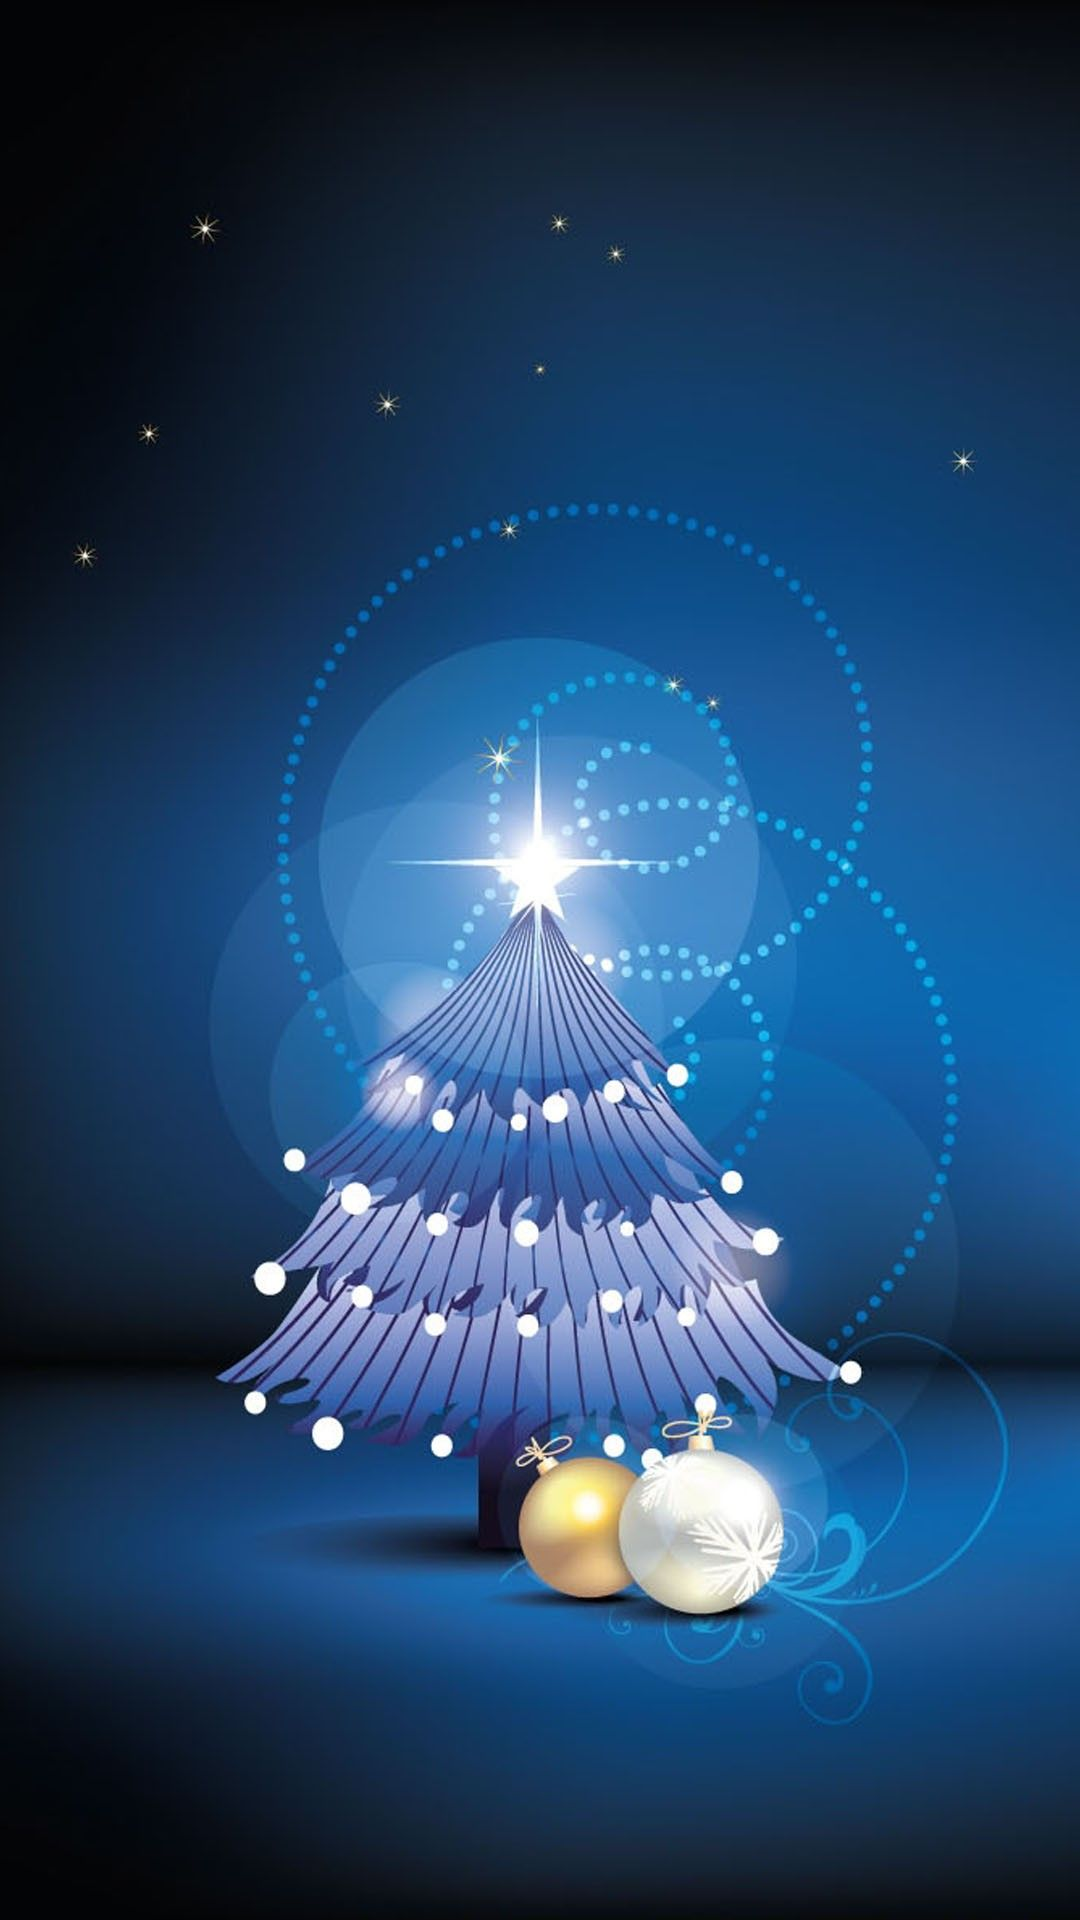 Wallpaper iphone natal - Night Christmas Tree Iphone 6 Plus Wallpaper Stars